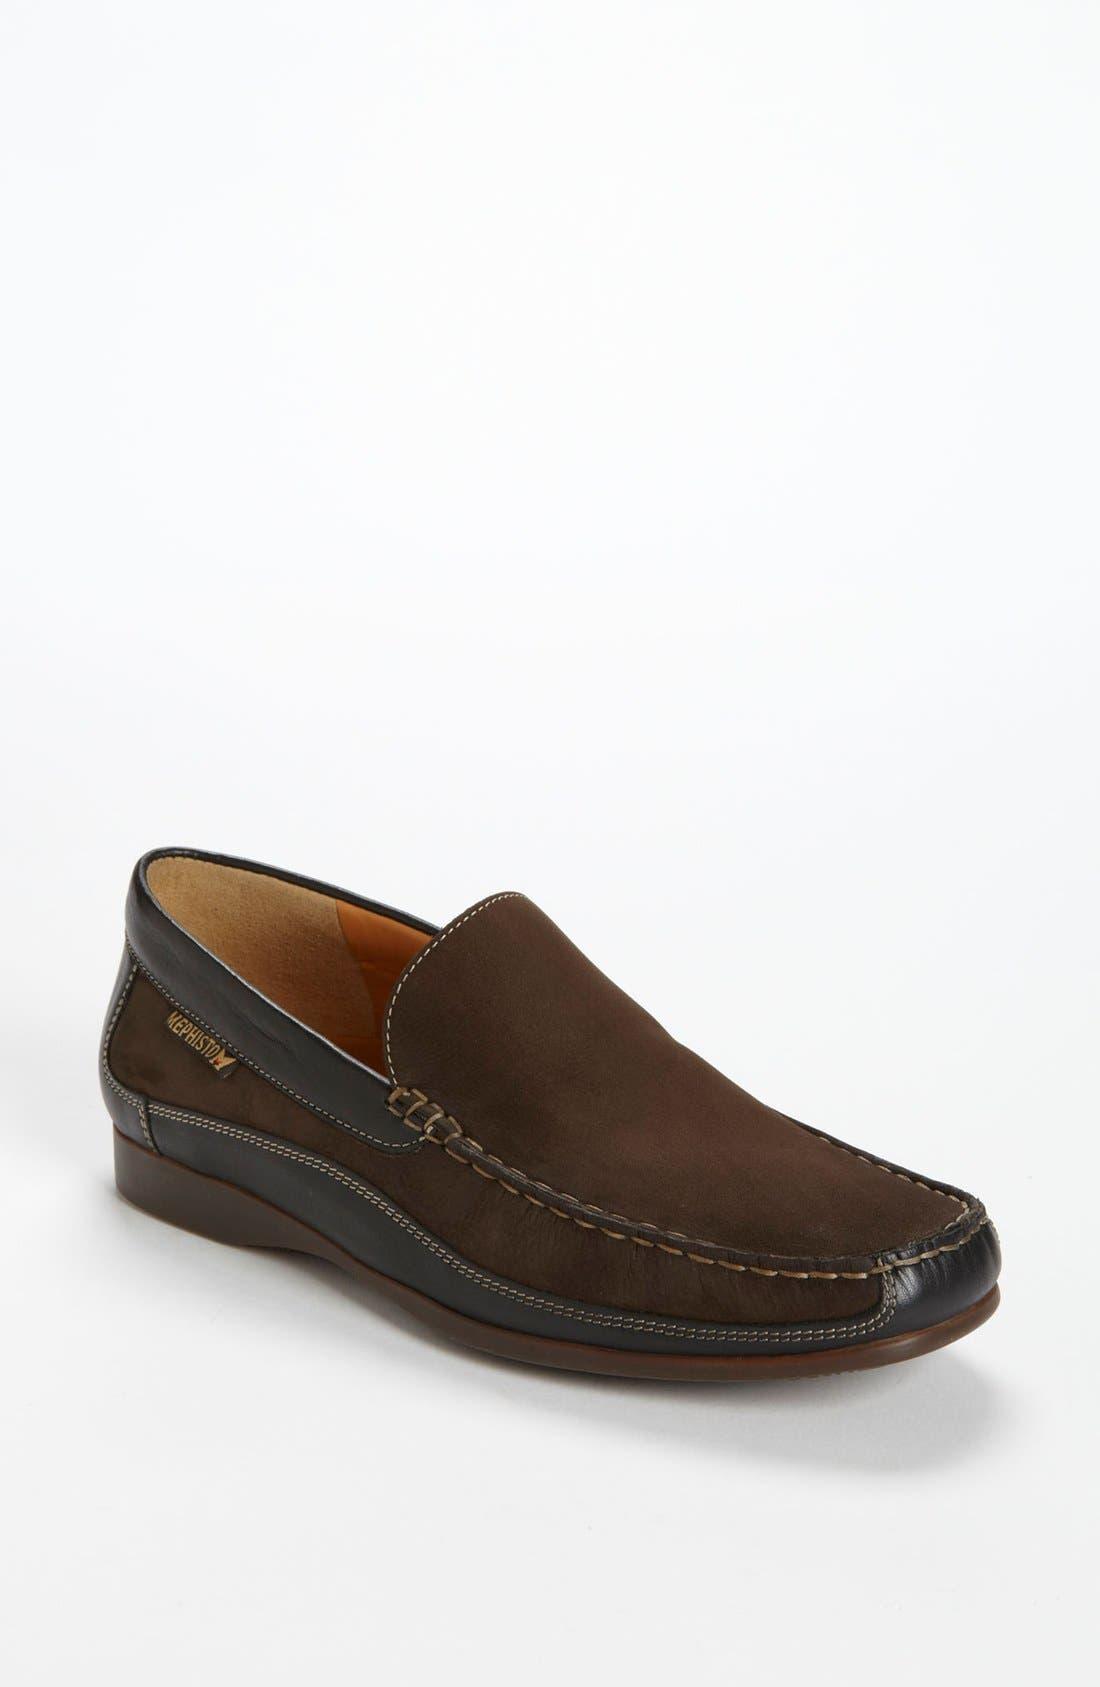 MEPHISTO 'Baduard' Loafer